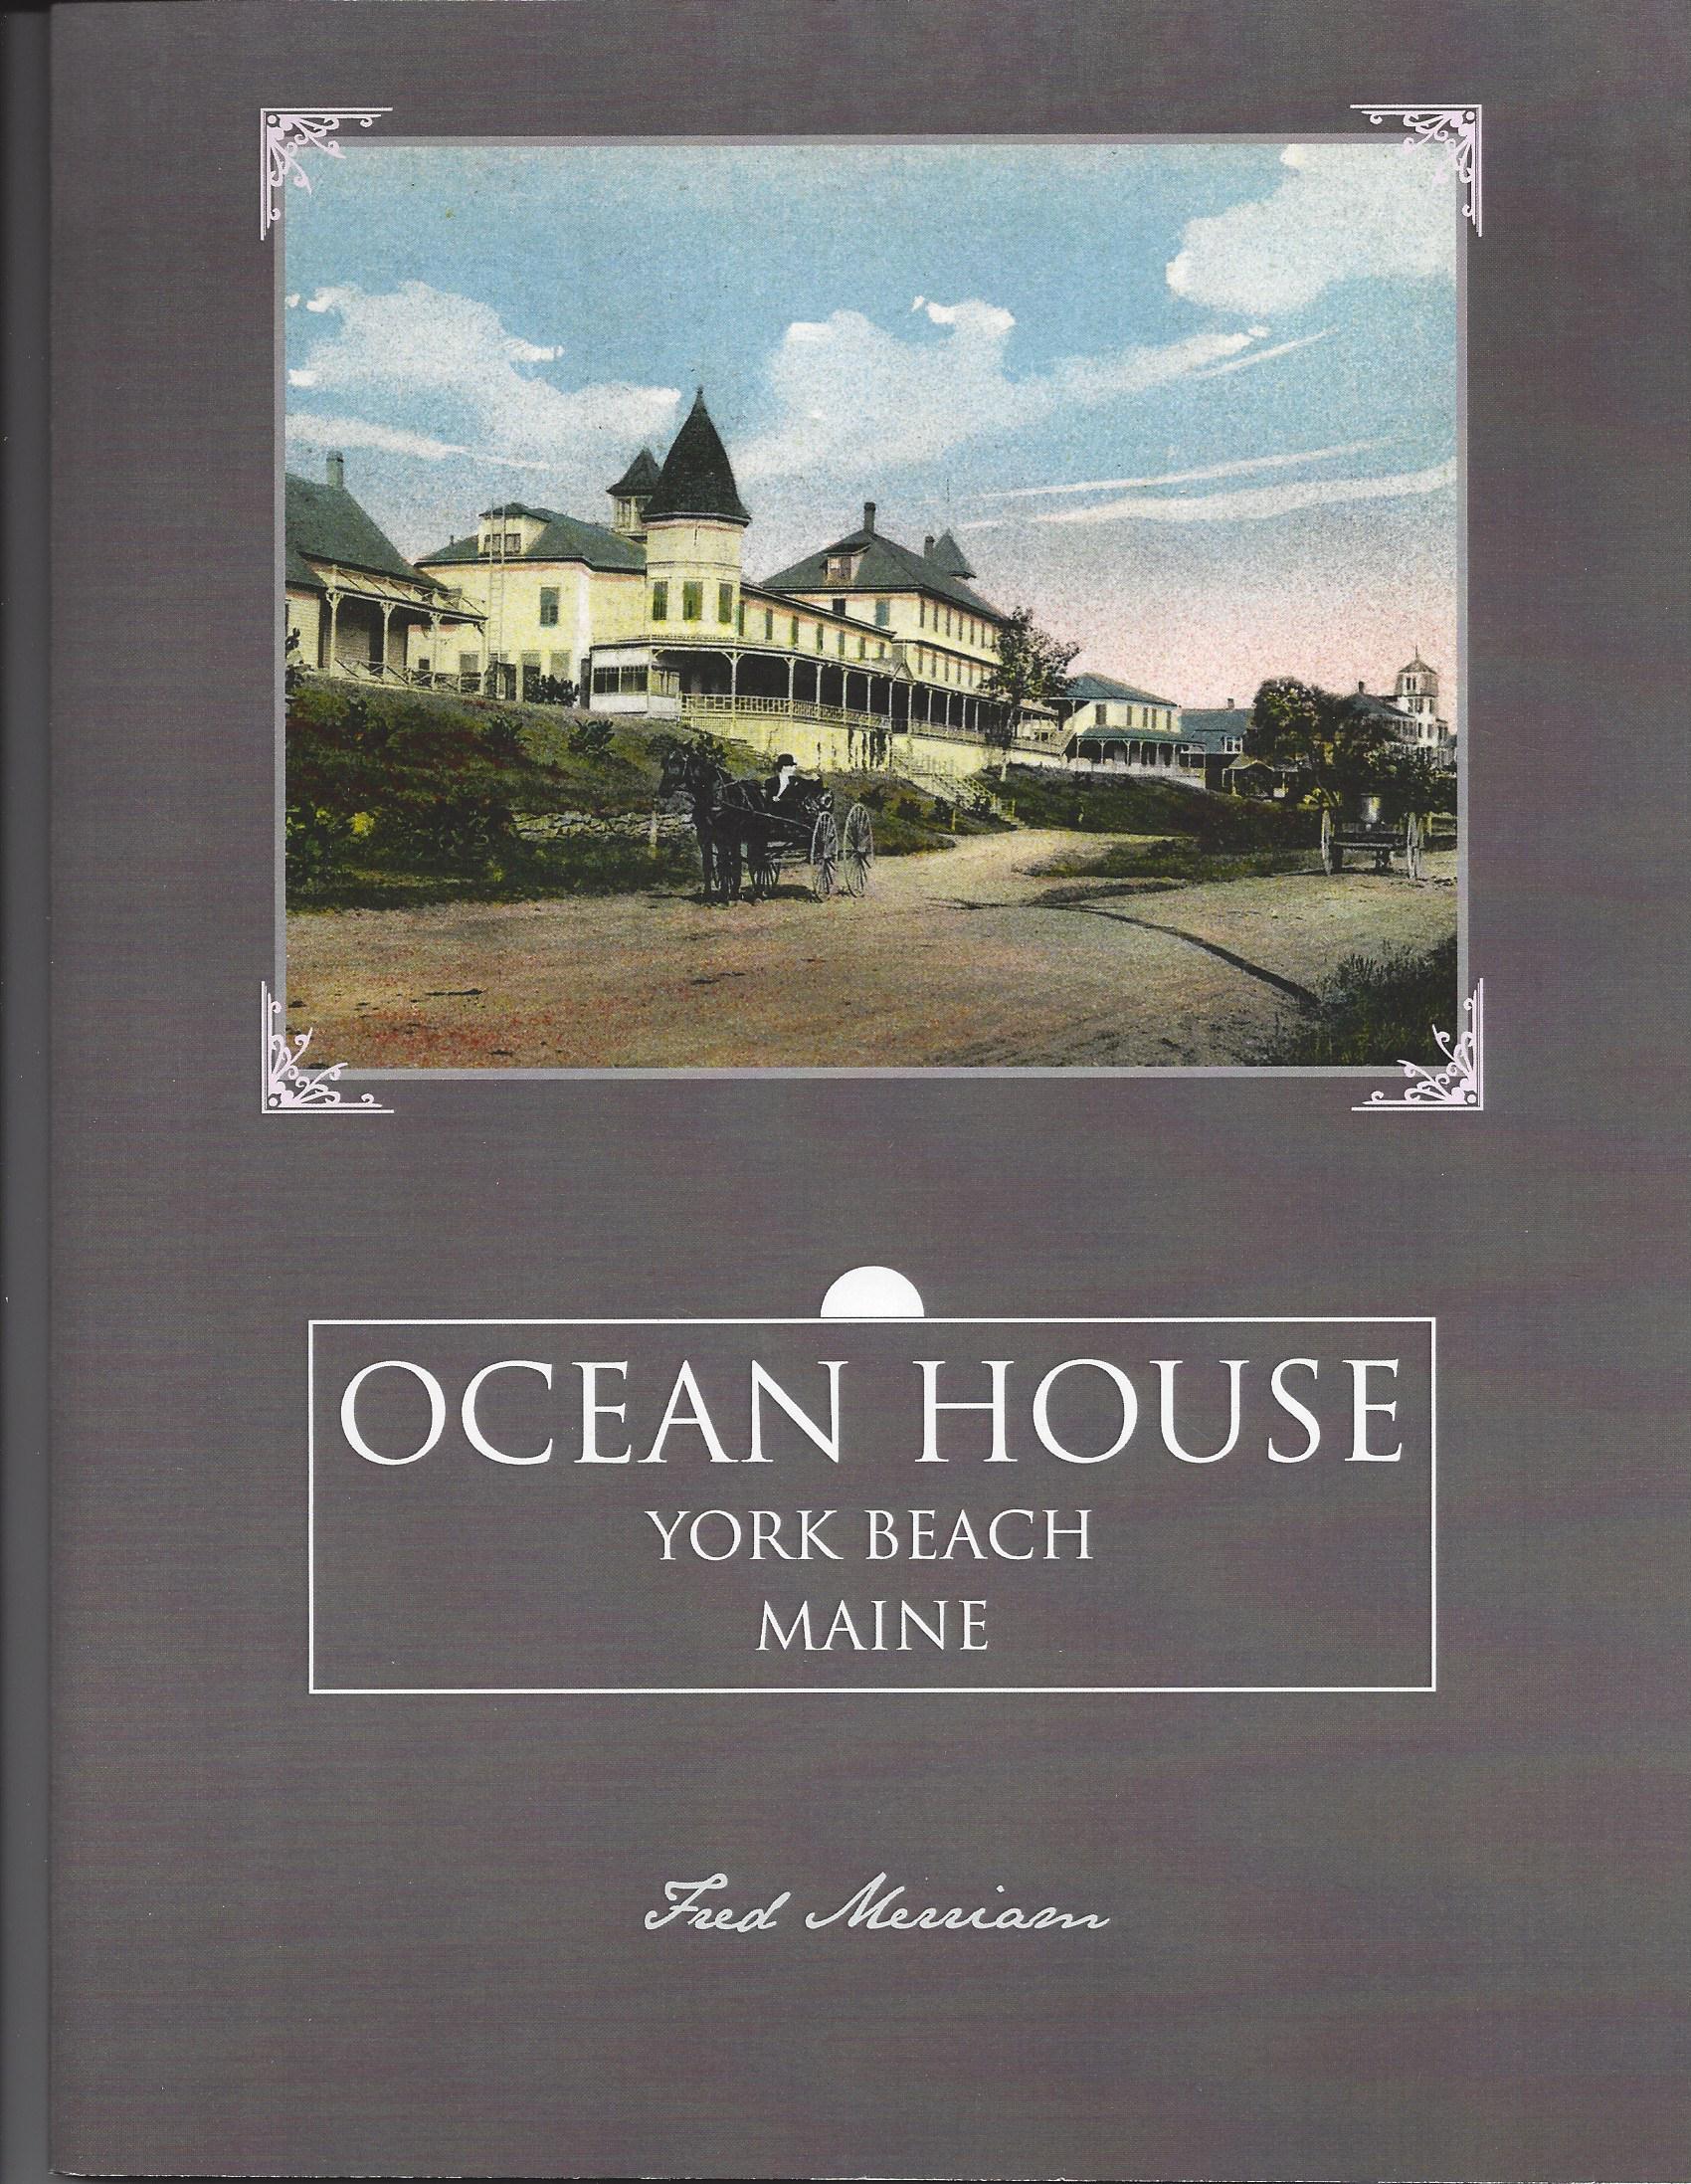 Ocean House York Beach Maine (Book), Merriam $18